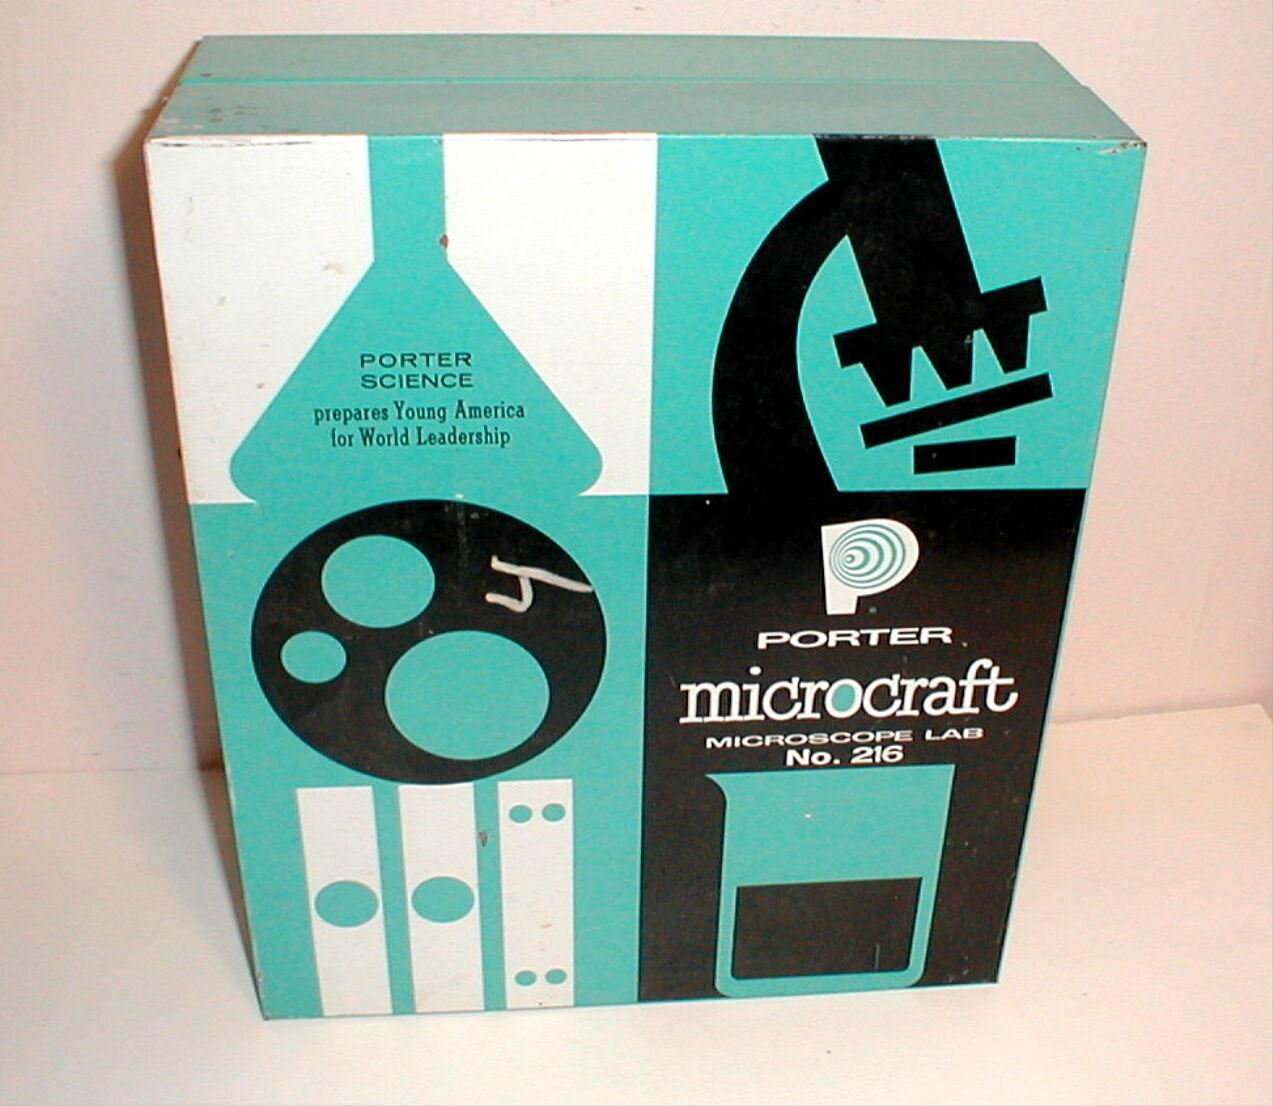 VINTAGE PORTER MICROCRAFT MICROSCOPE LAB NO.216